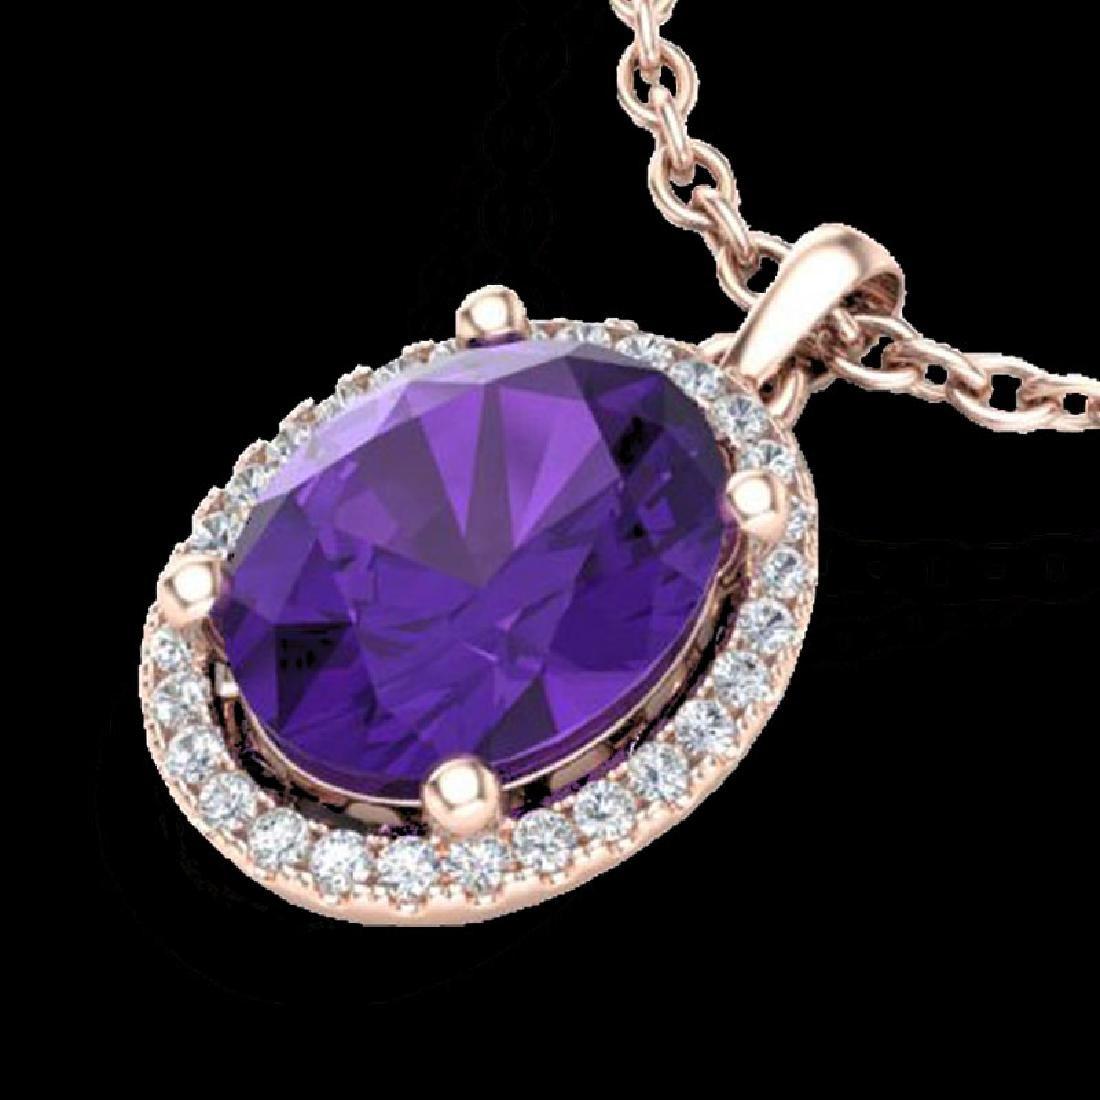 2.50 CTW Amethyst & Micro Pave VS/SI Diamond Necklace